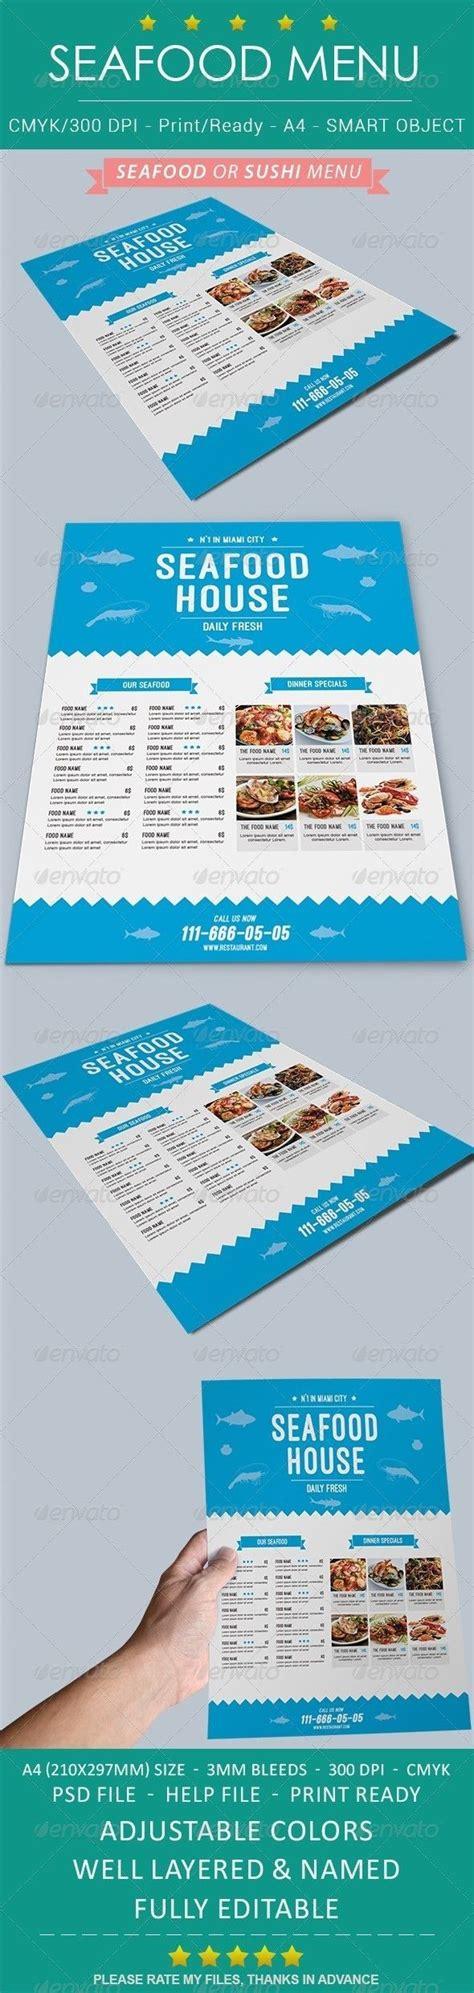 Seafood Sushi Restaurant Menu Restaurant Menu Template Seafood And Flyers Seafood Menu Template